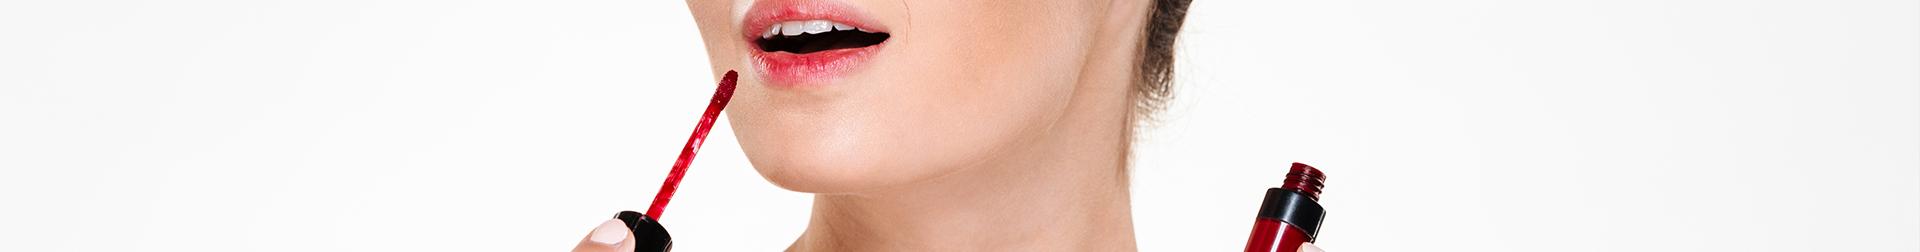 Makeup Lip Products   Buy Lip Gloss Online   AromaCraze